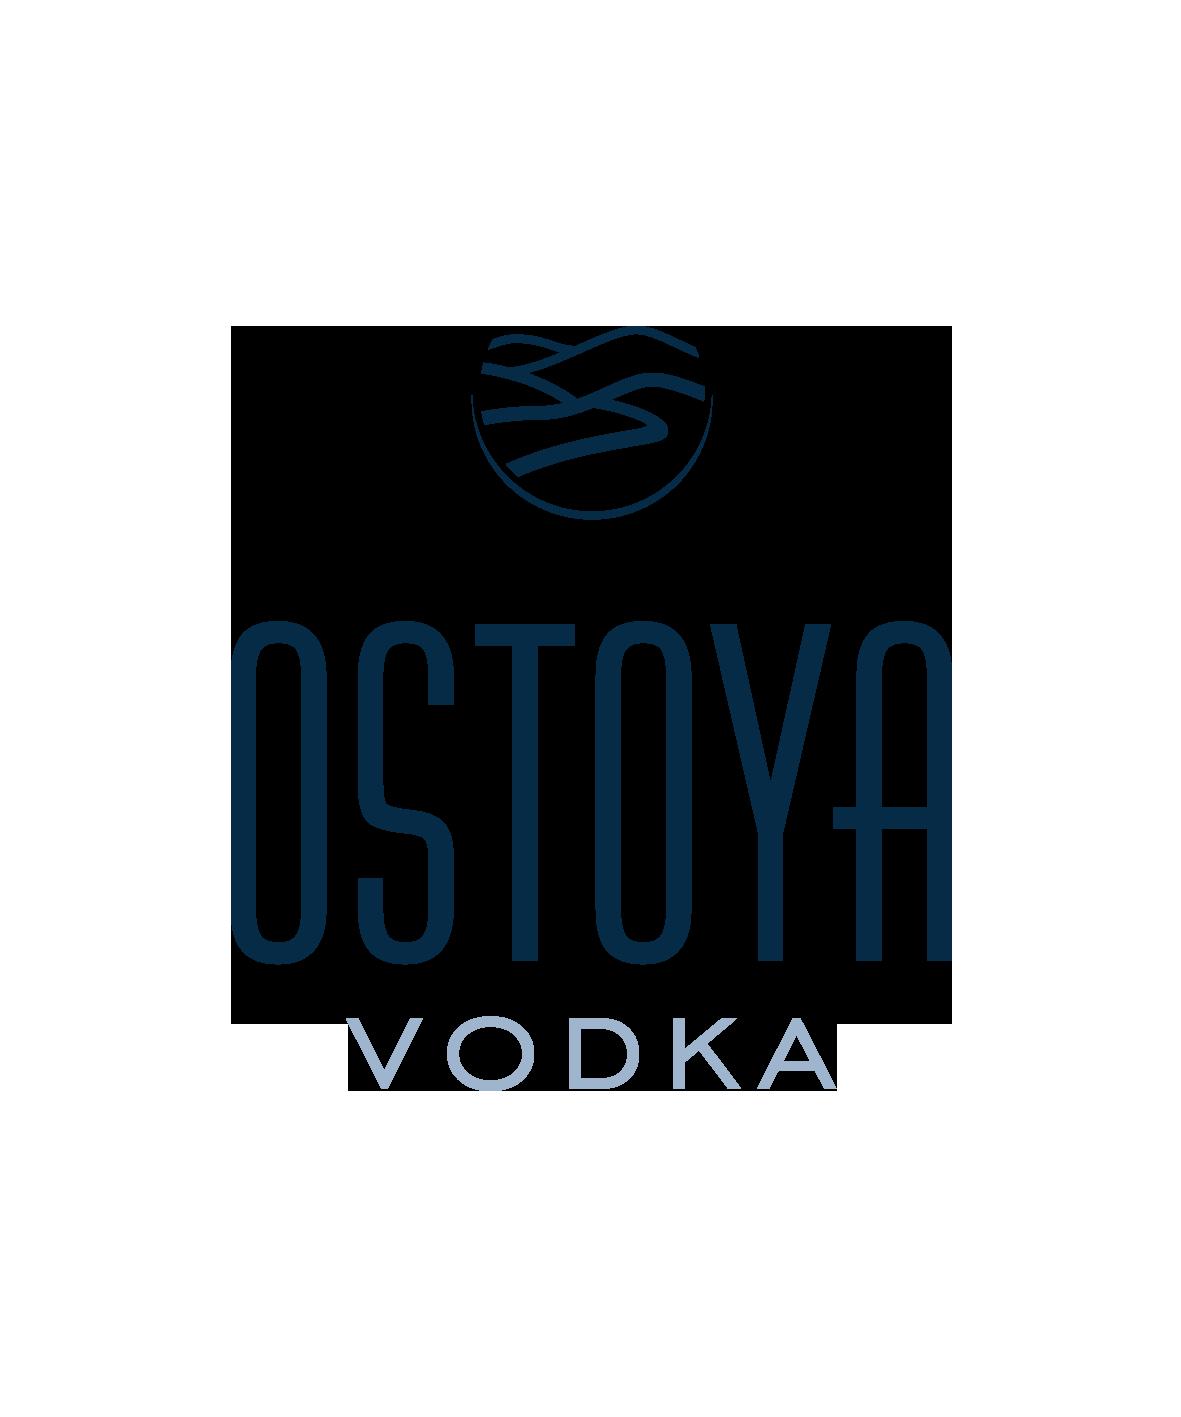 logo Ostoya.png